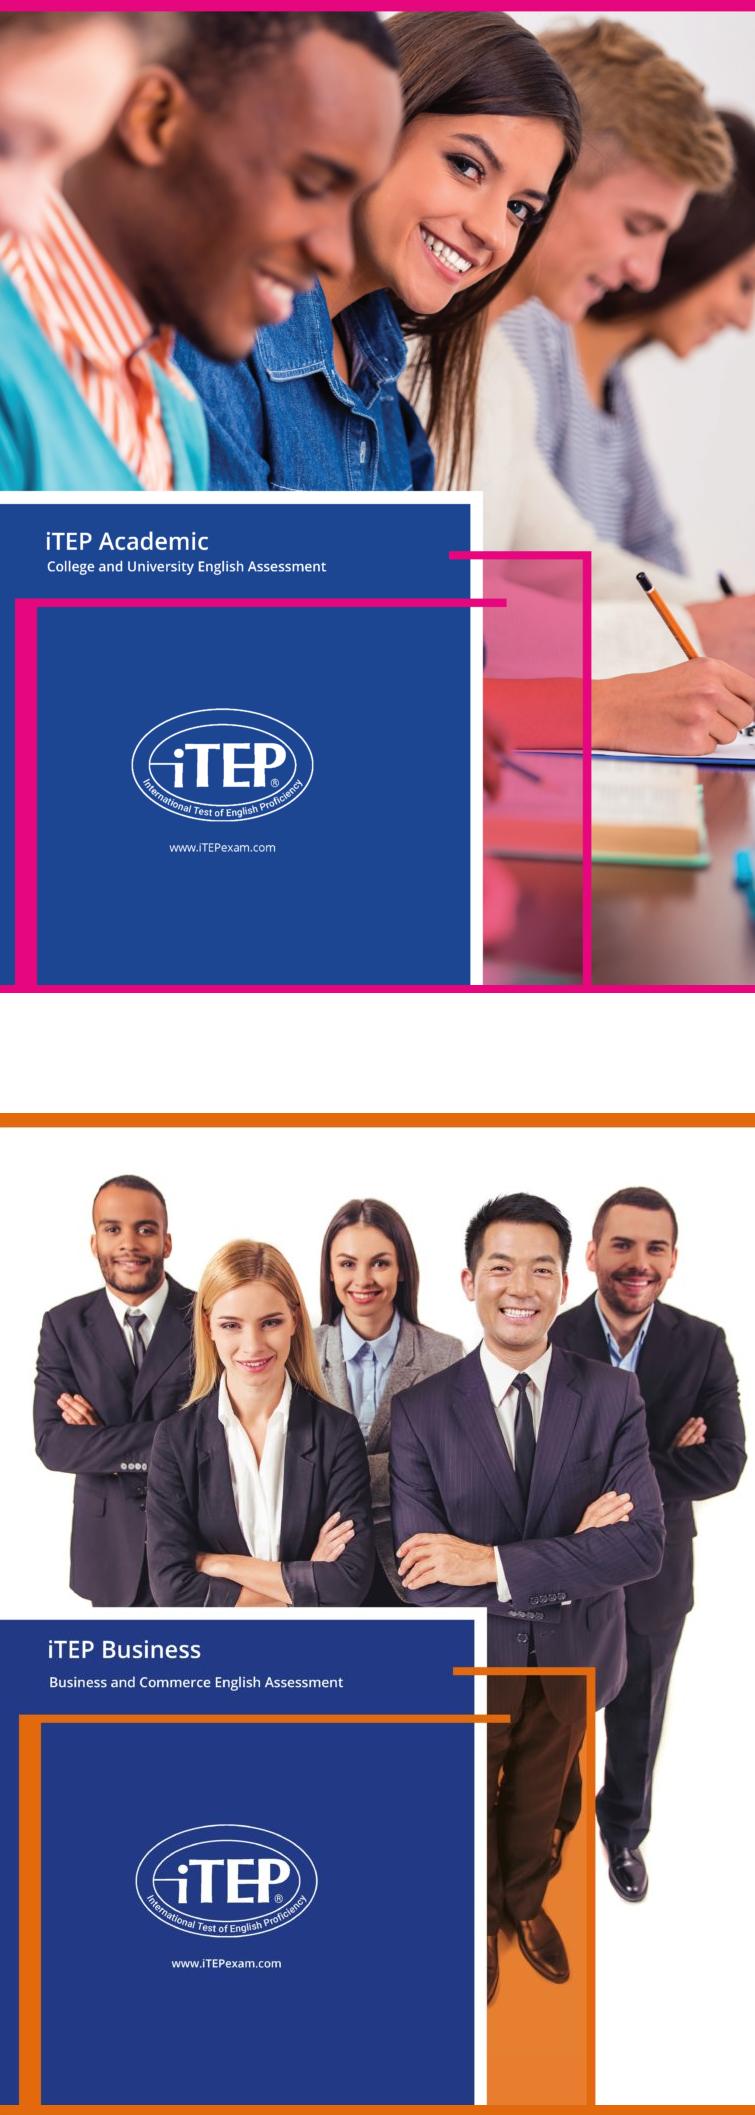 iTEP Practice Tests